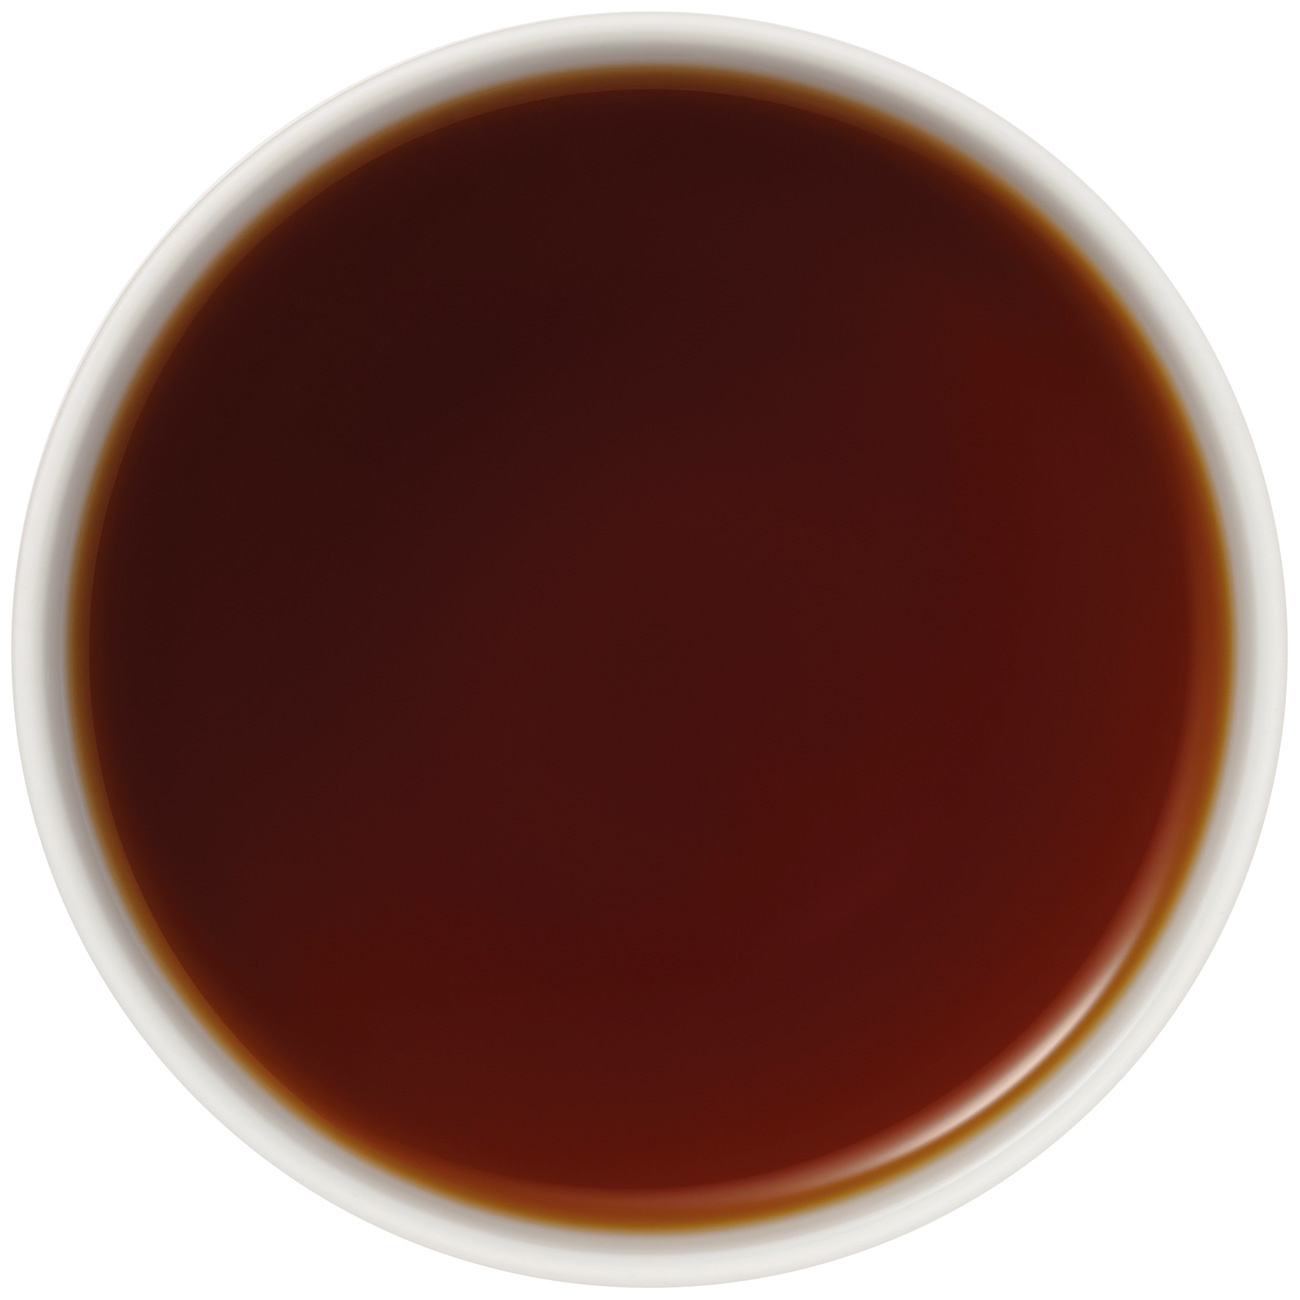 De Pelikaan Thee Oranje Pecco Melange-3